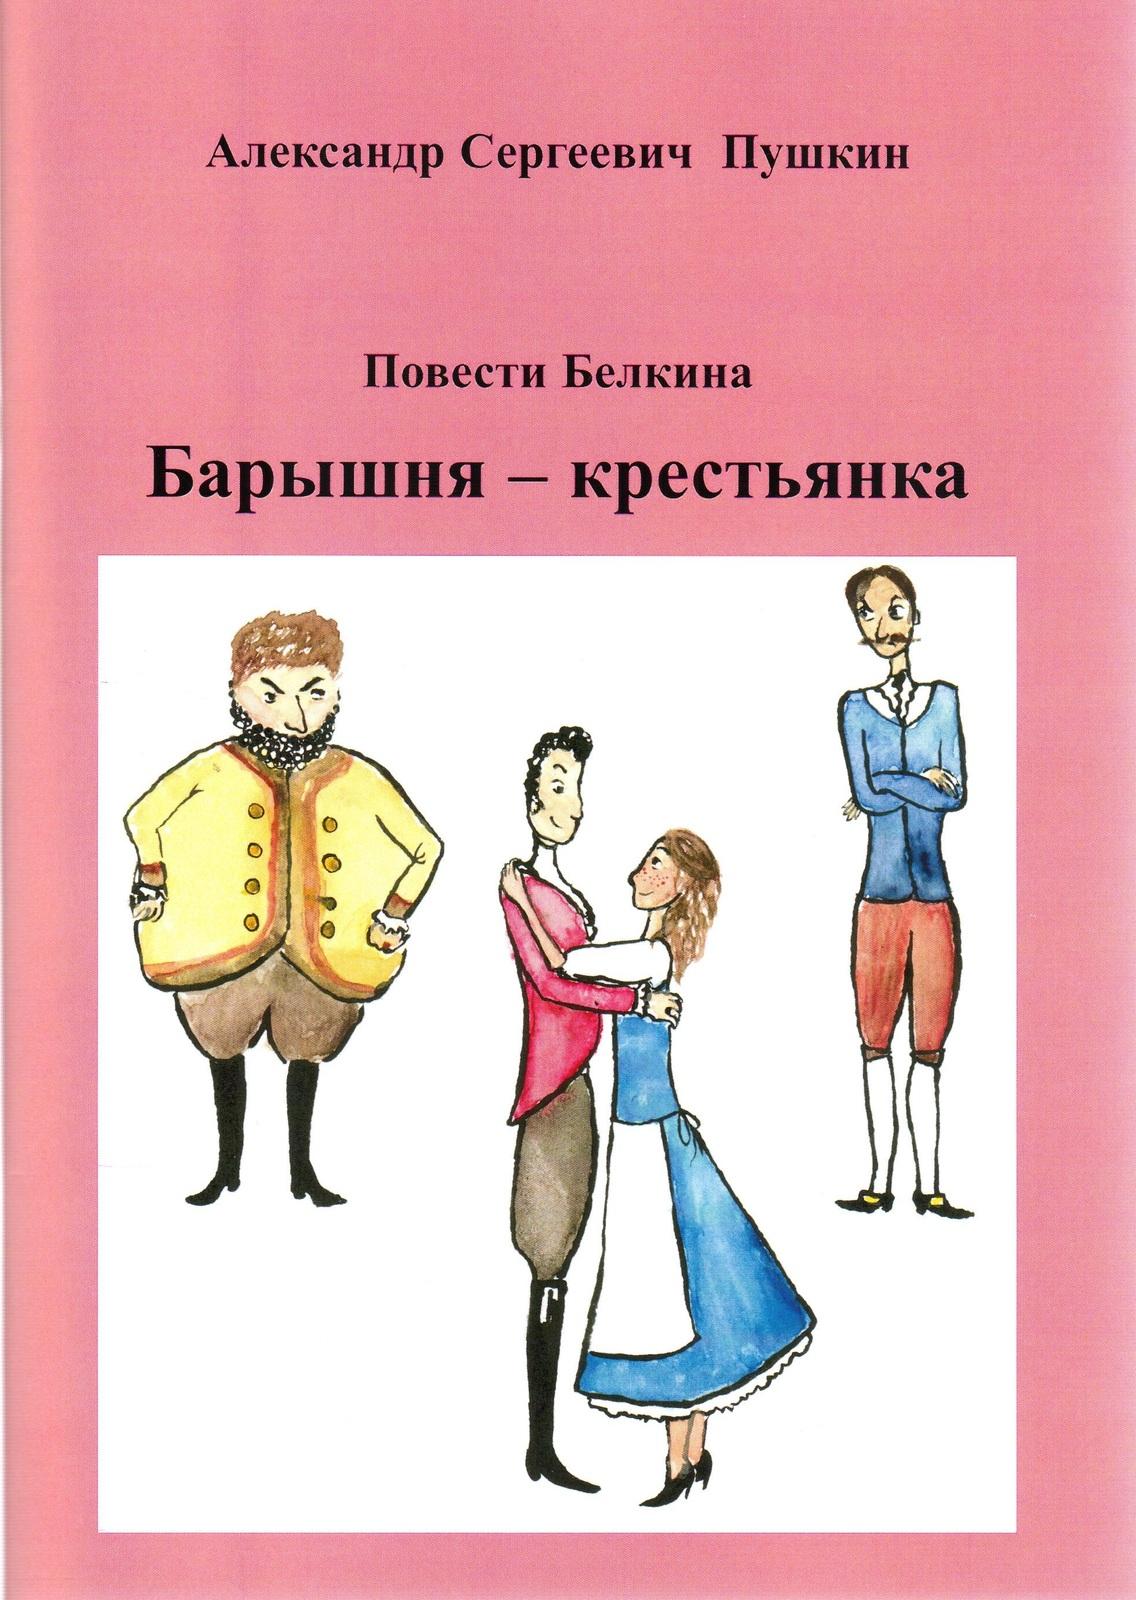 Пушкин барышня крестьянка слушать онлайн